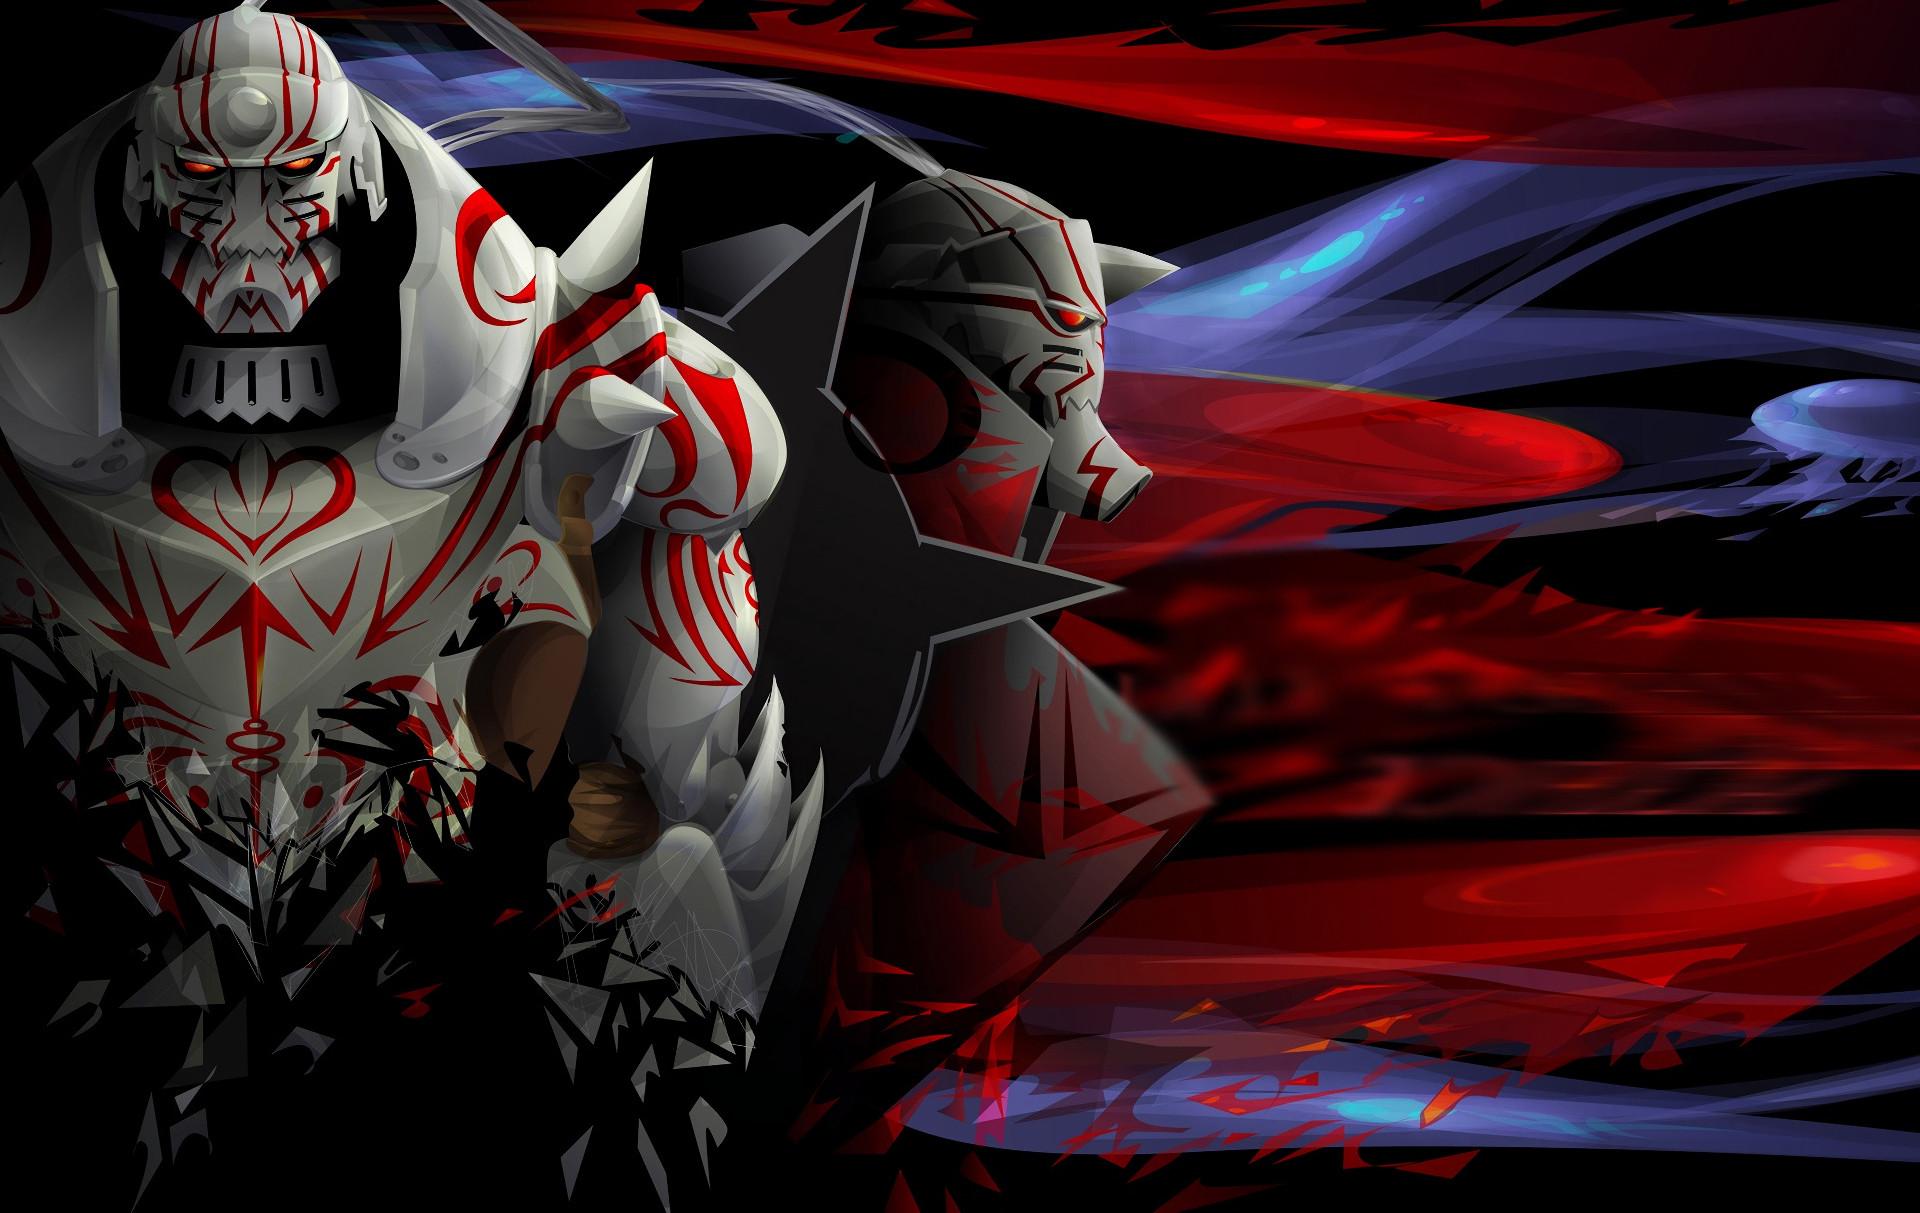 Fullmetal Alchemist Brotherhood Wallpapers Wallpapertag